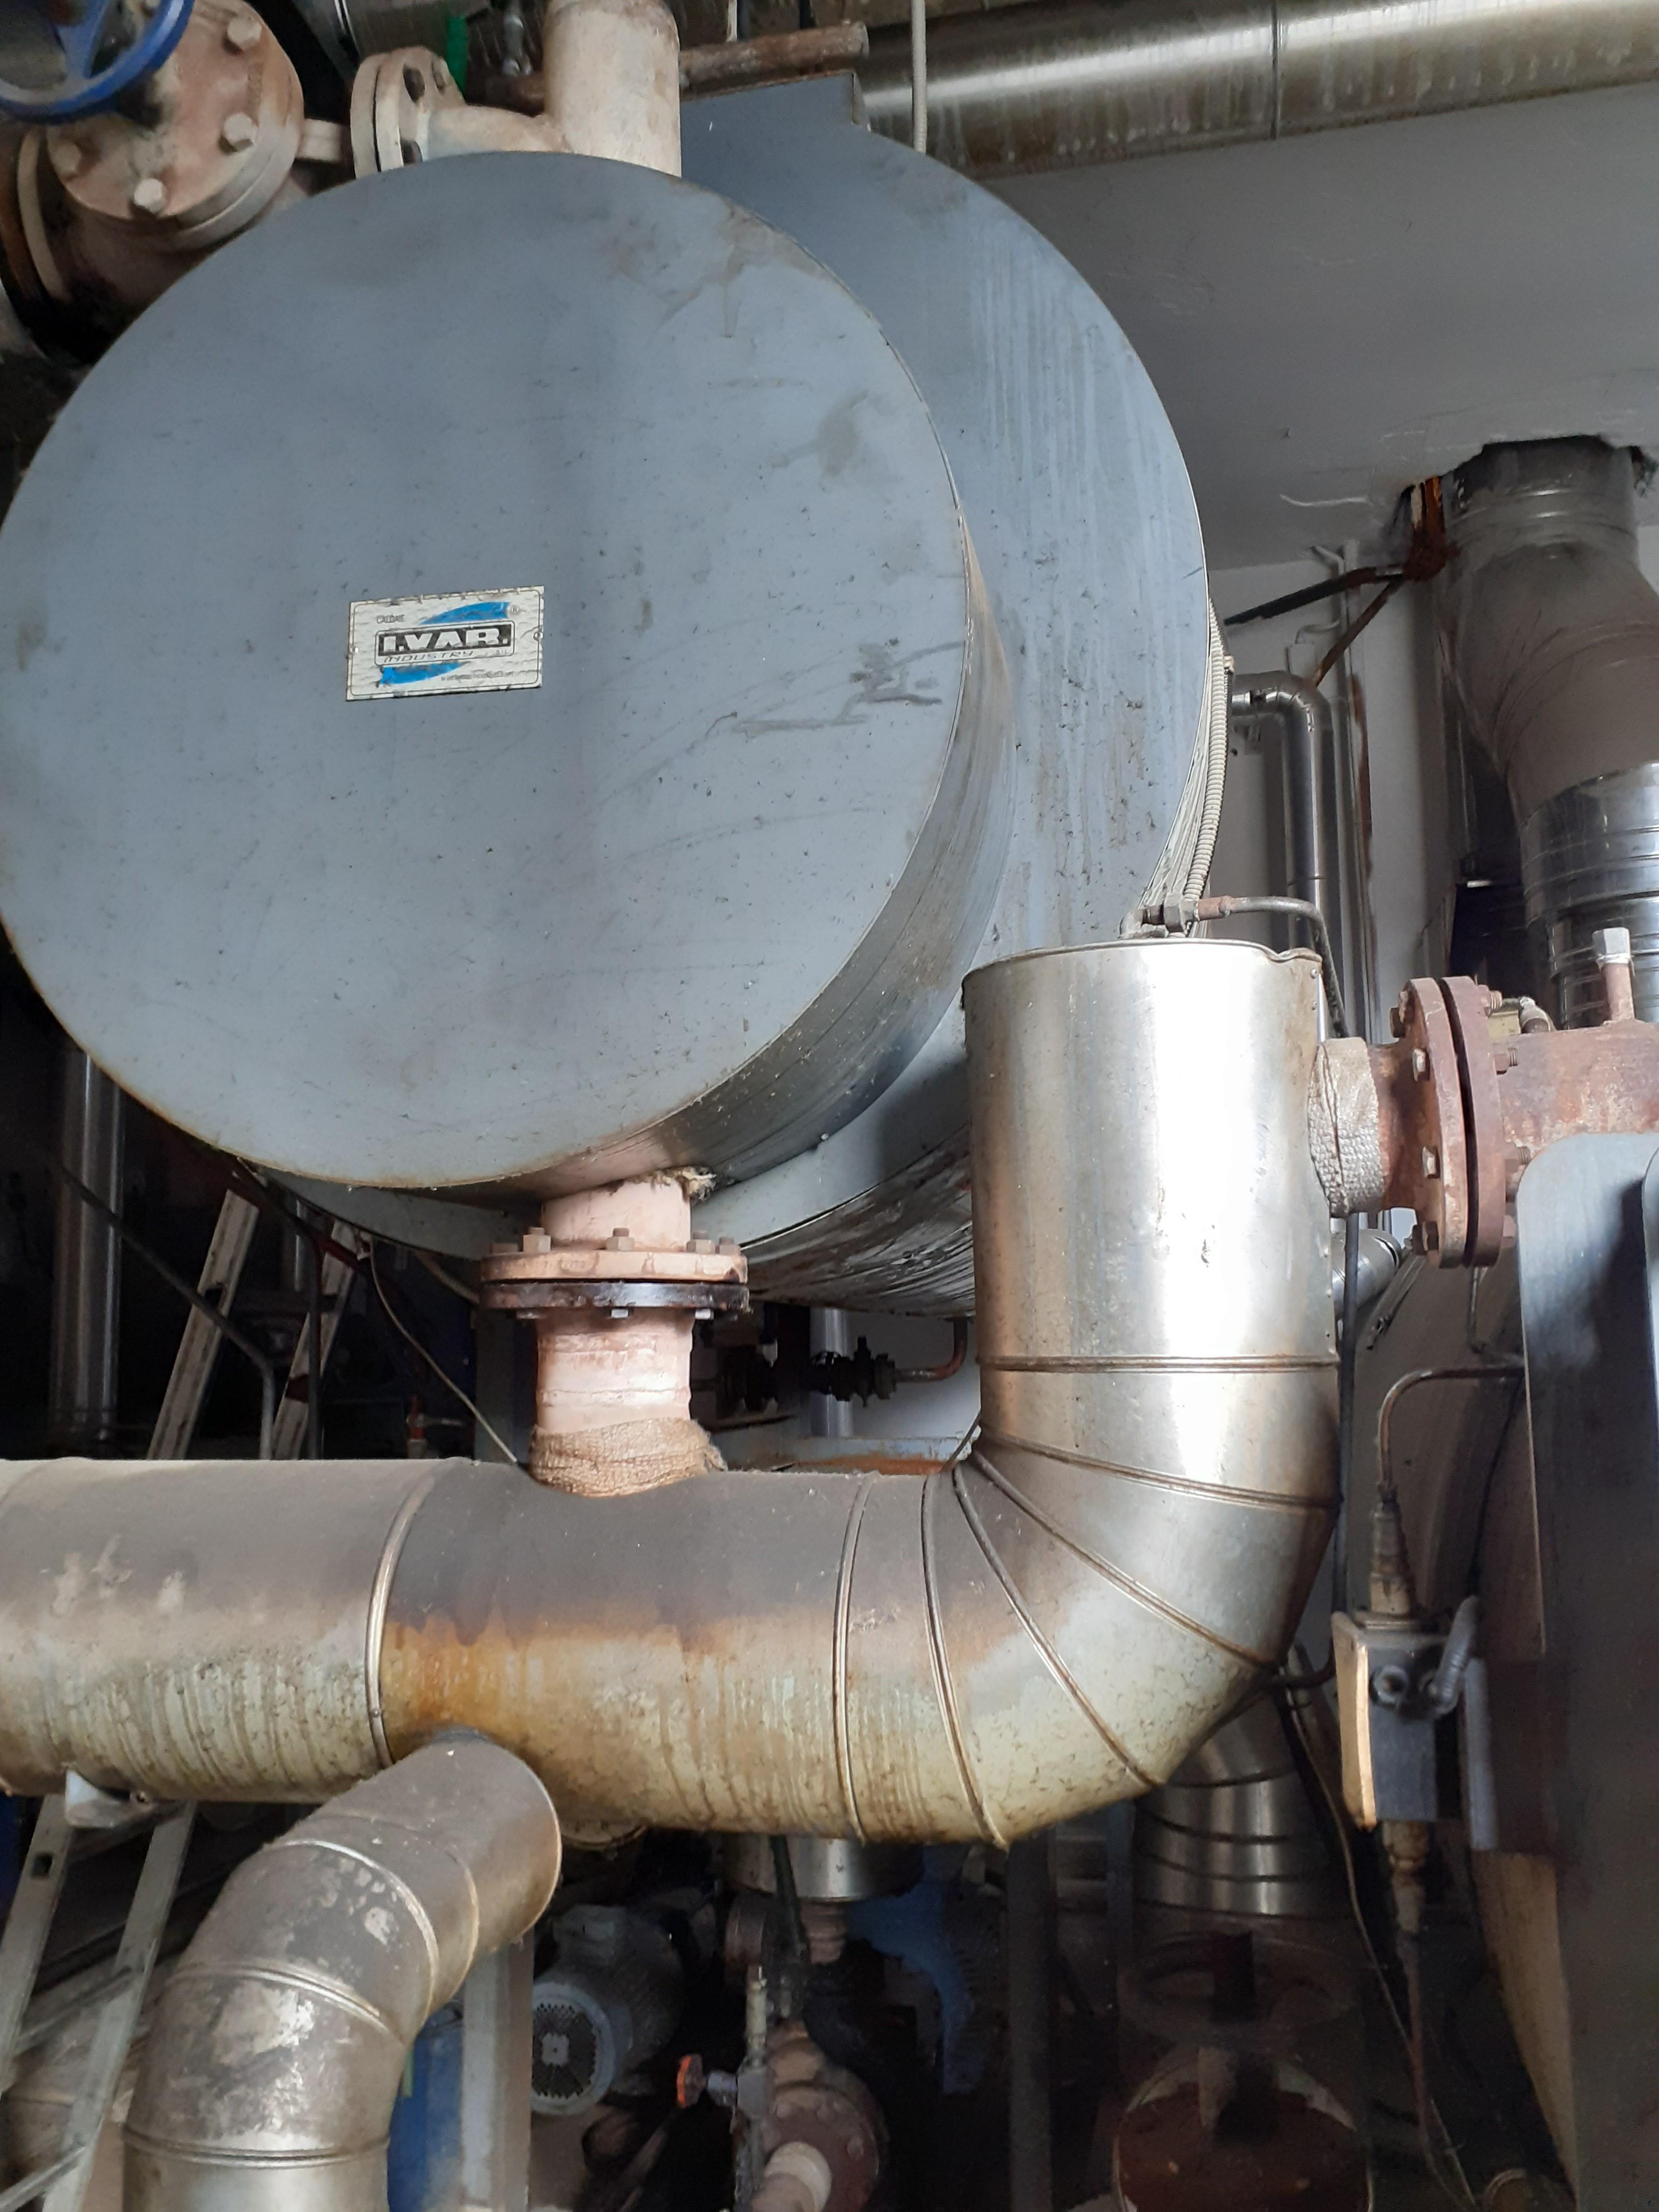 centrale termica in vendita - foto 11